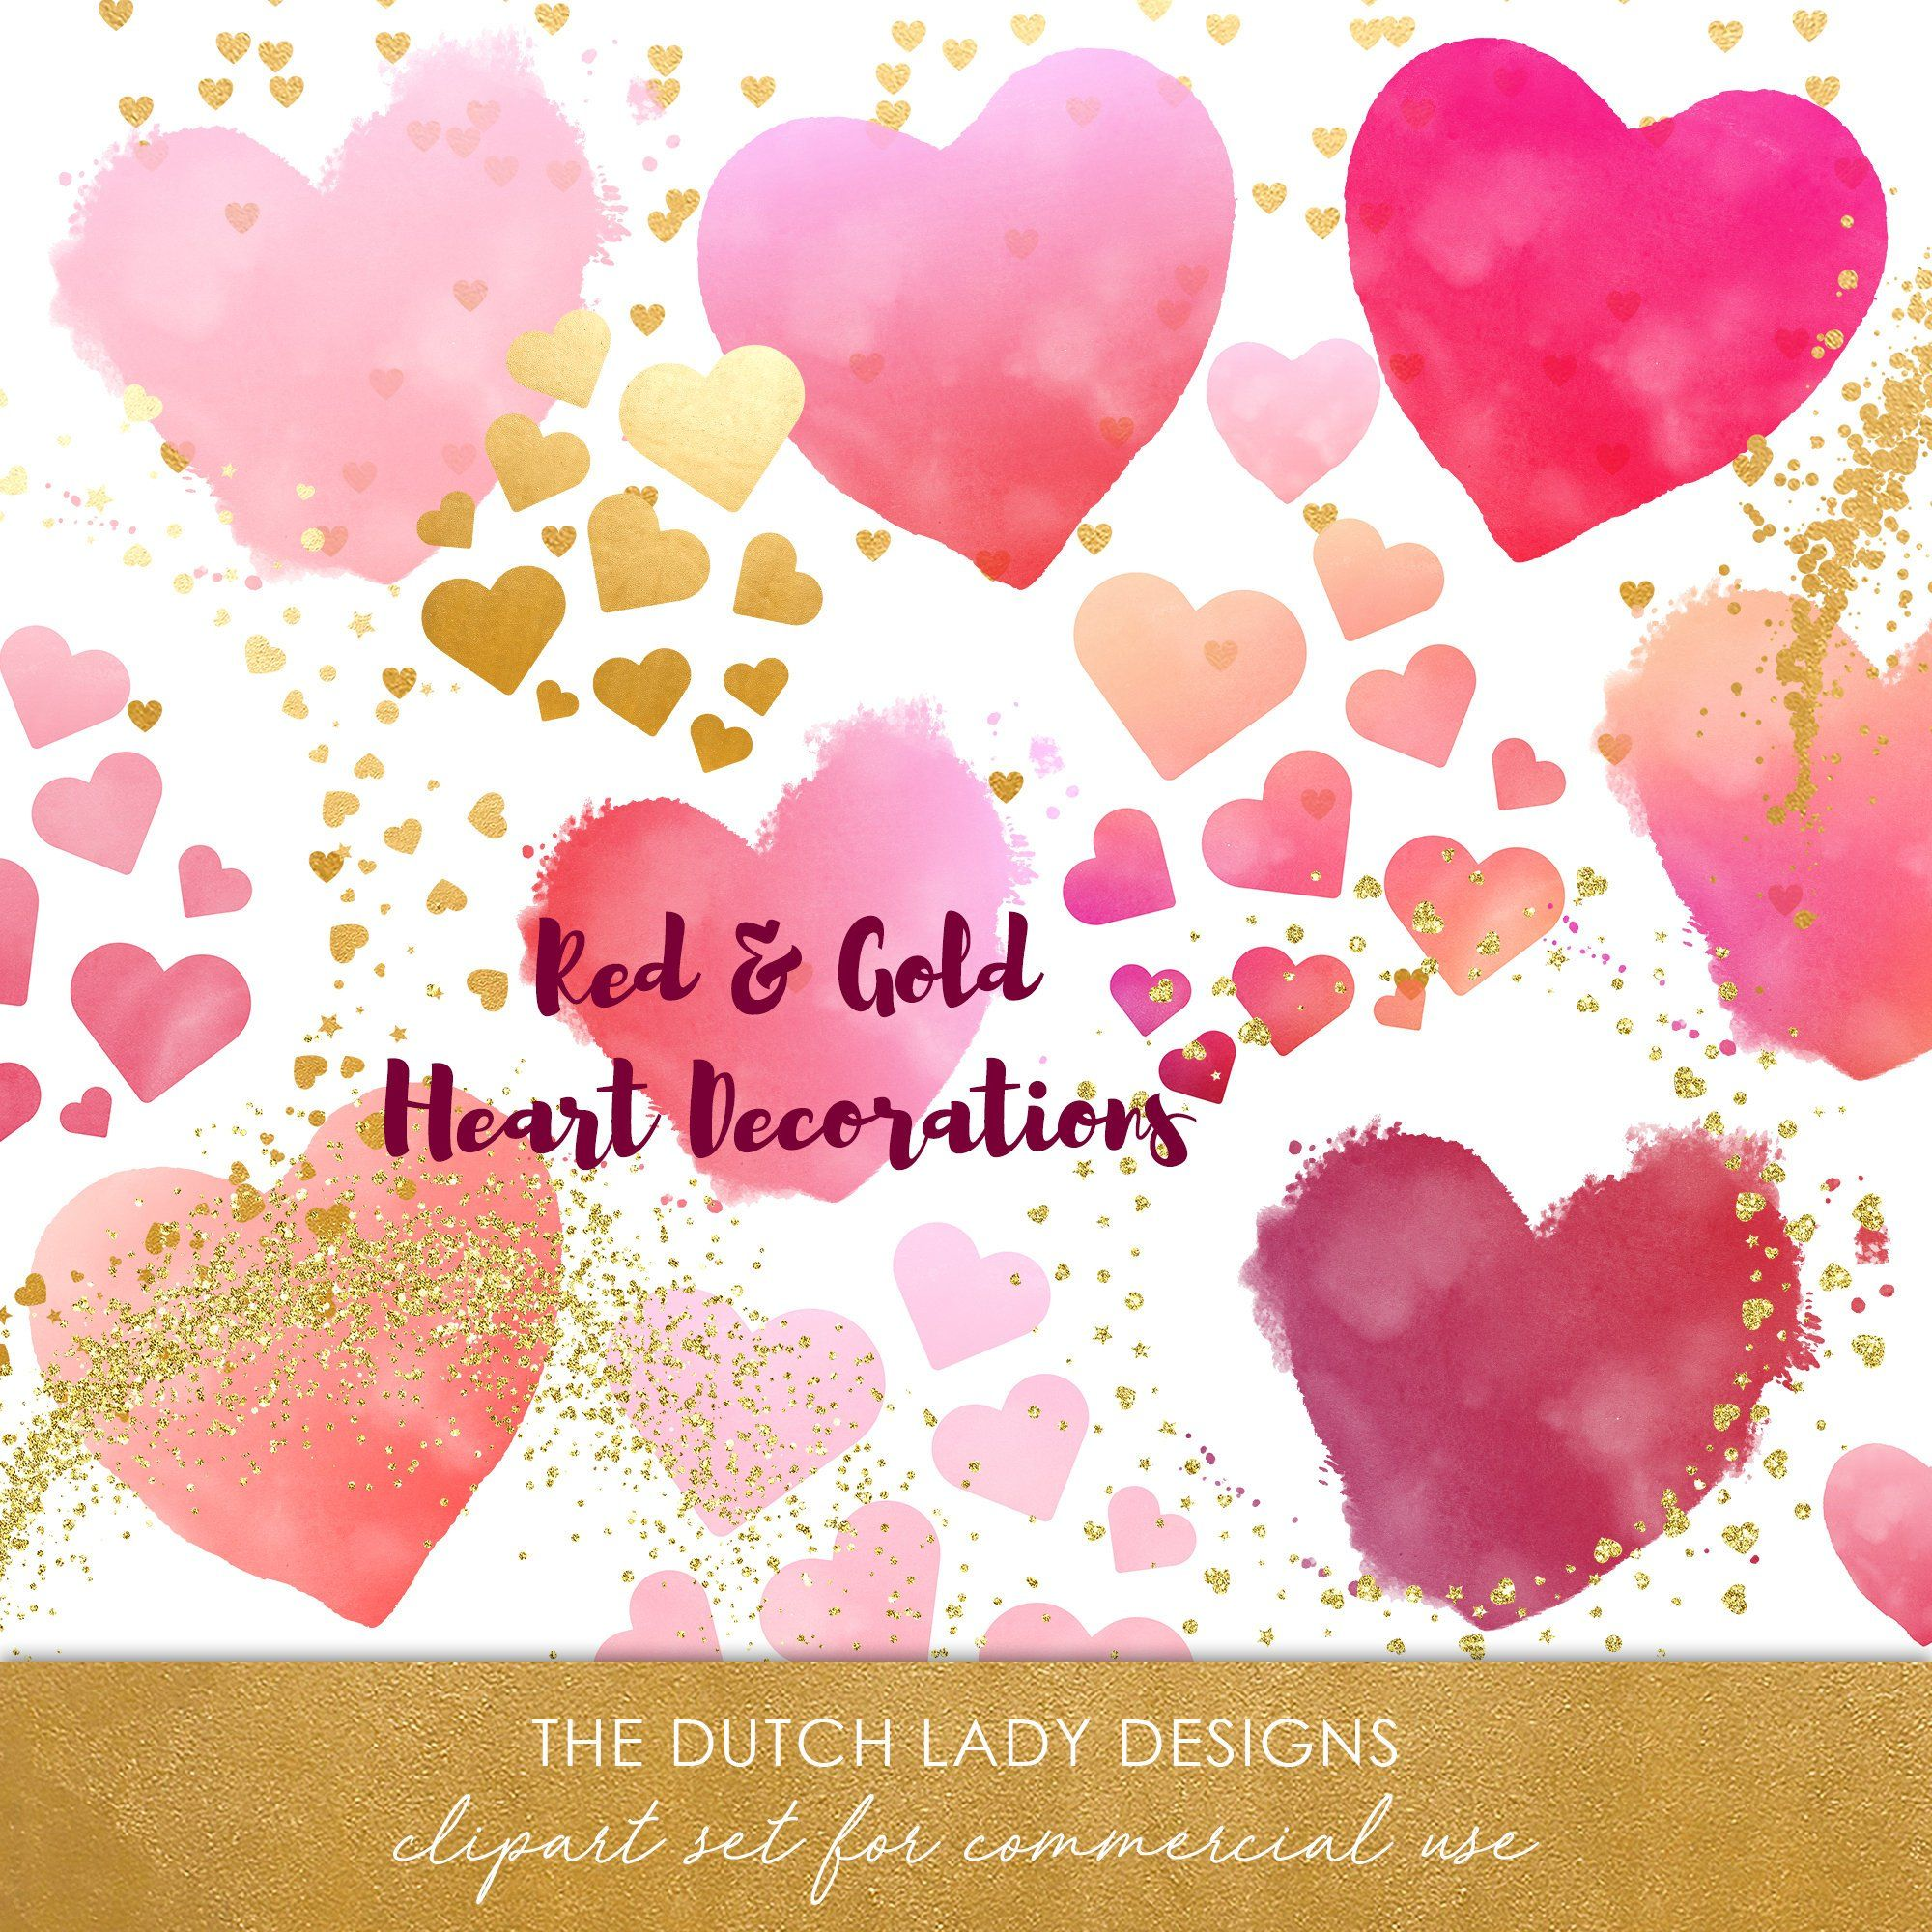 medium resolution of heart clipart valentine clipart love clipart wedding clipart playful hearts watercolor hearts golden decoration digital decoration golden sprinkles